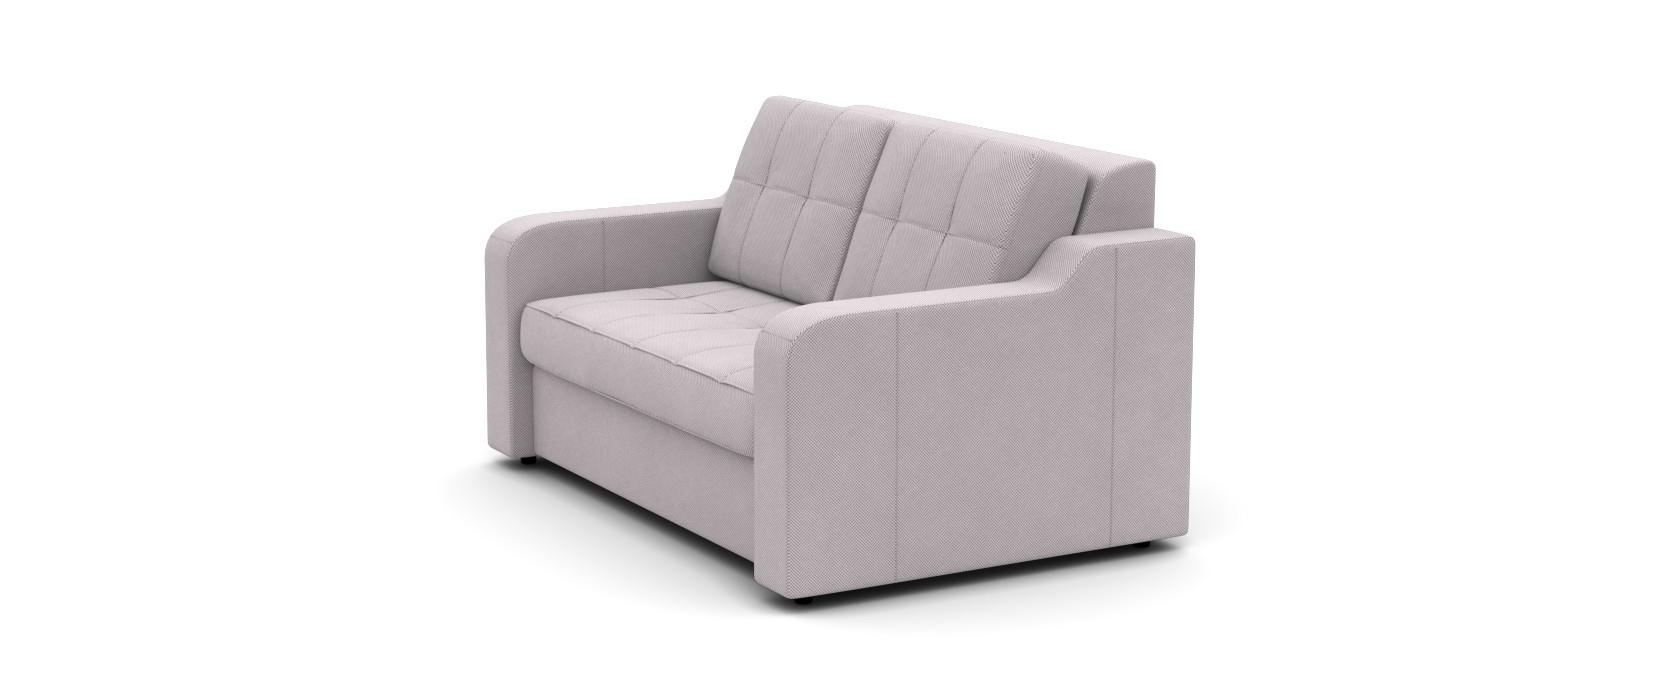 Трехместный диван Vito